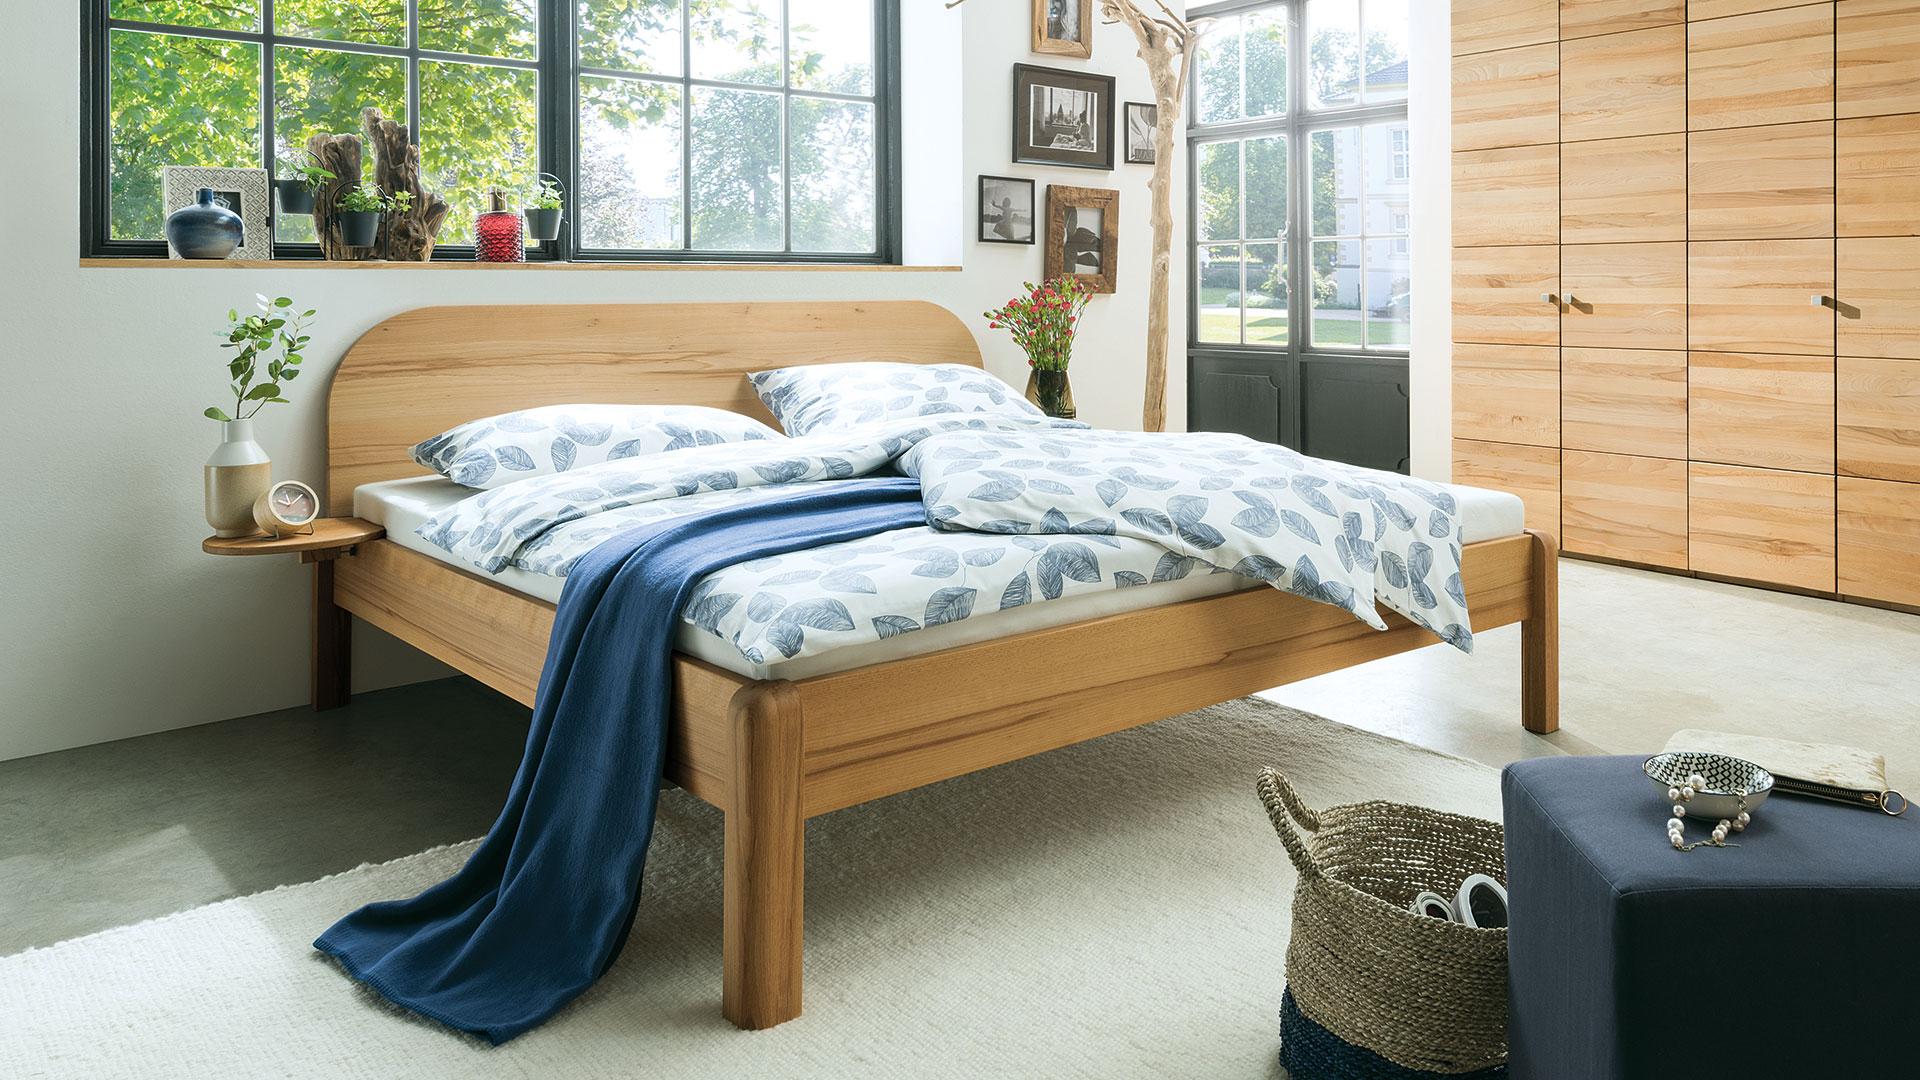 Allnatura Betten einzelbett und doppelbett siena 01 allnatura de